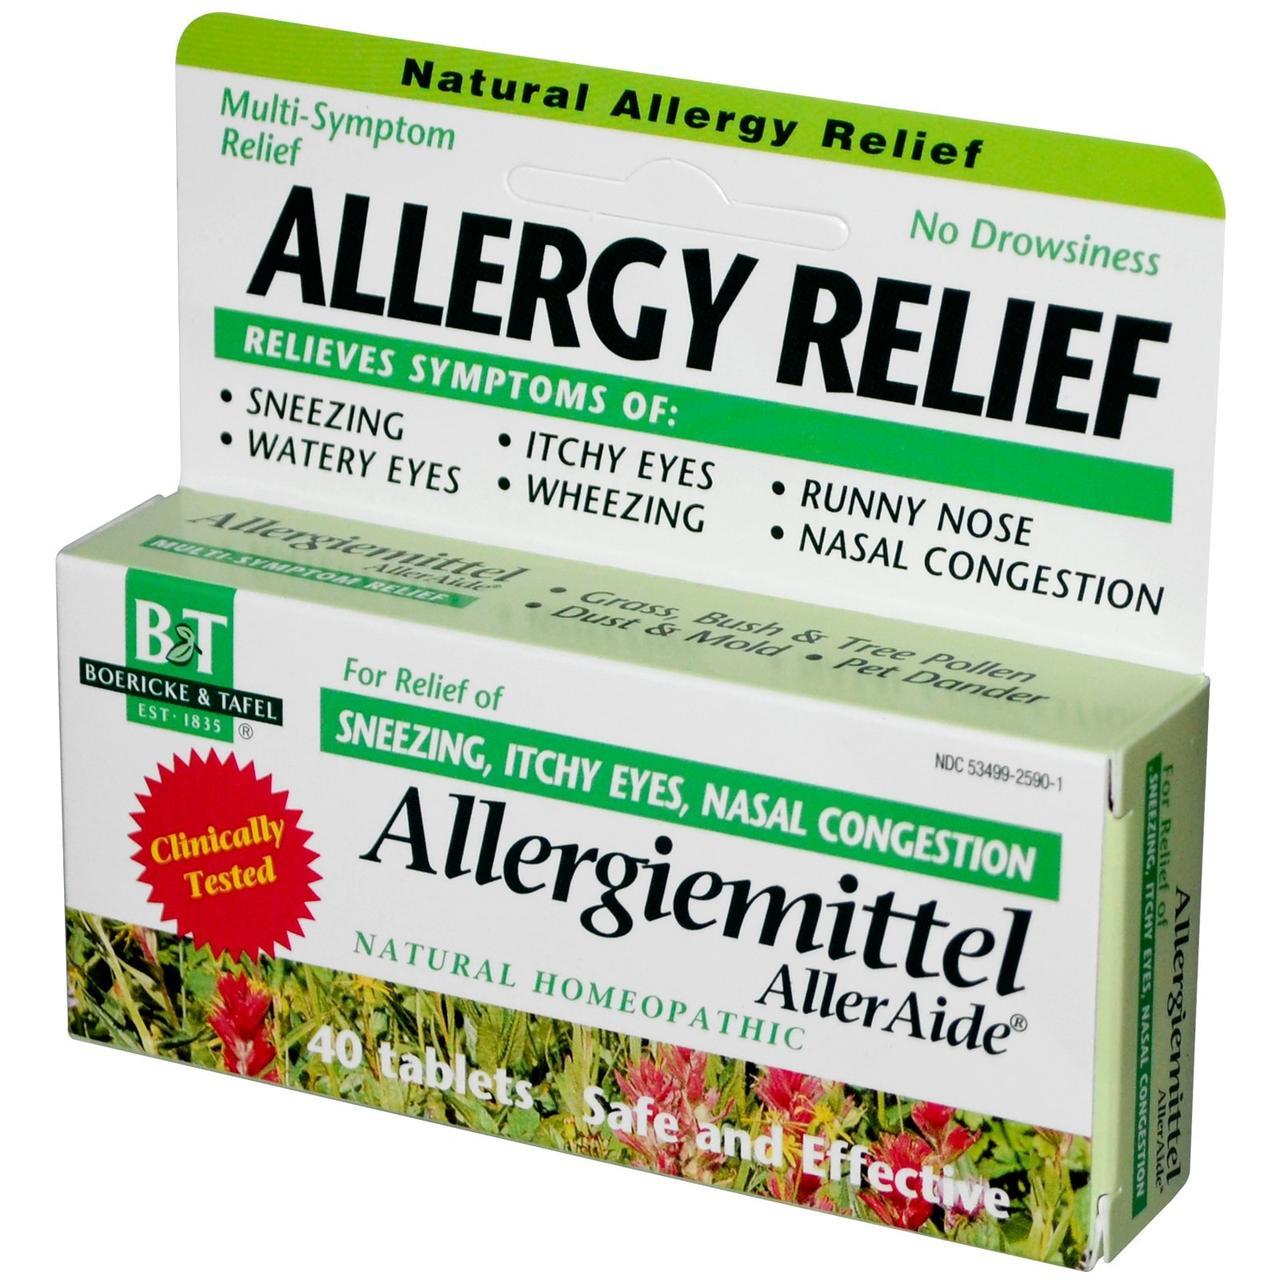 Boericke & Tafel, Протиалергічний засіб, Allergiemittel AllerAide, 40 пігулок